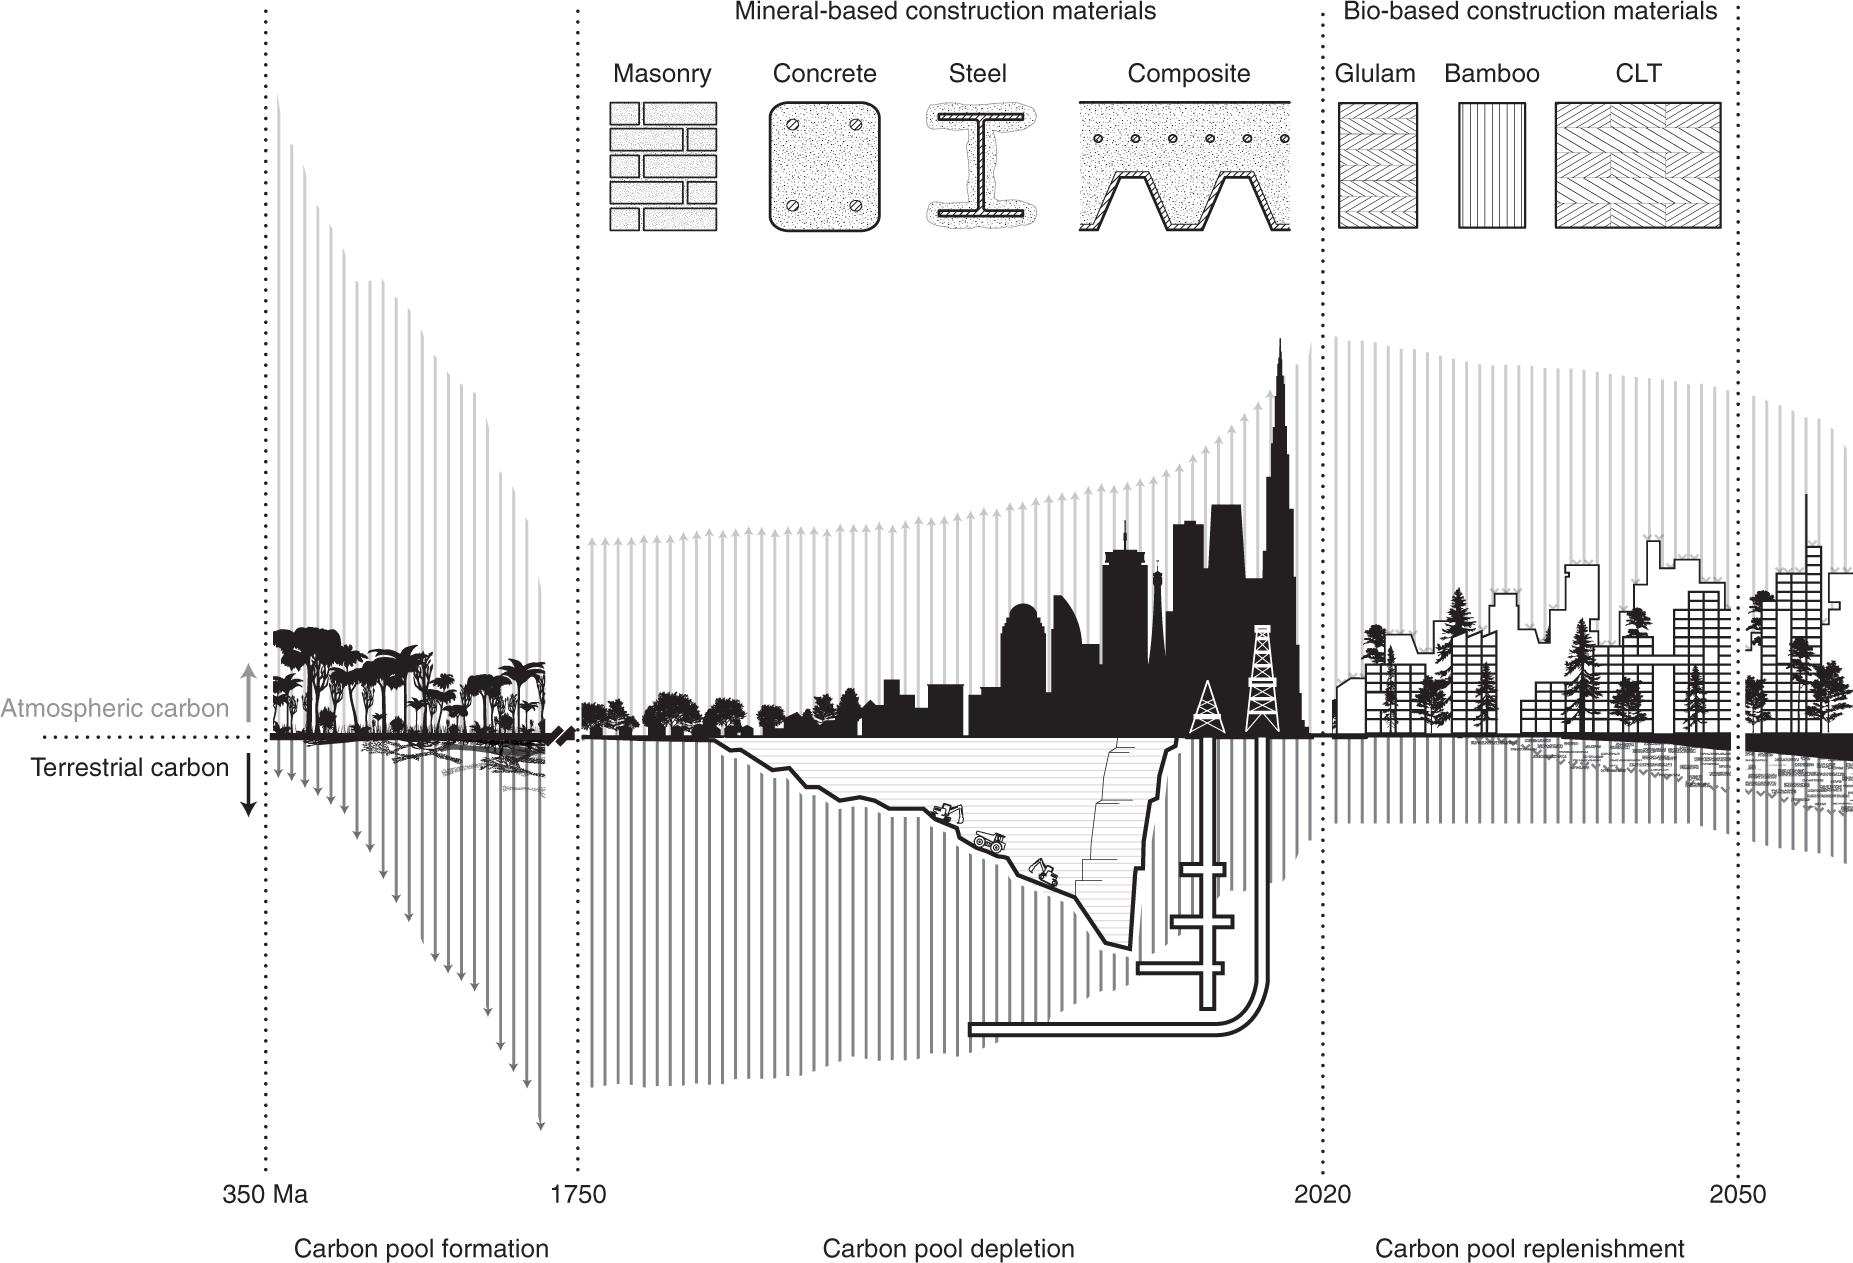 Buildings as a global carbon sink